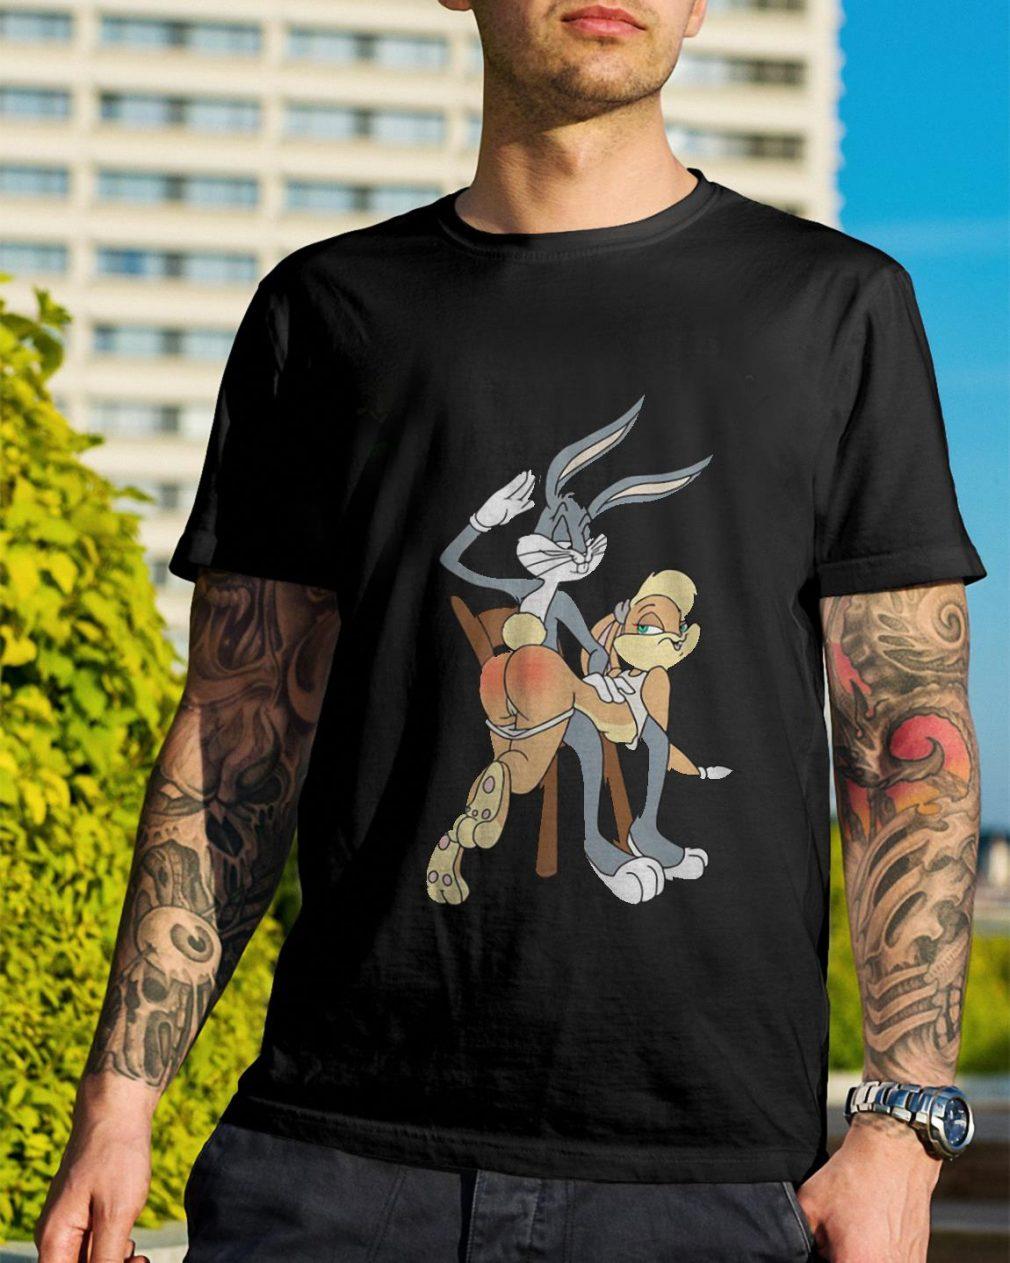 Disney Bugs Bunny and Lola sexy shirt